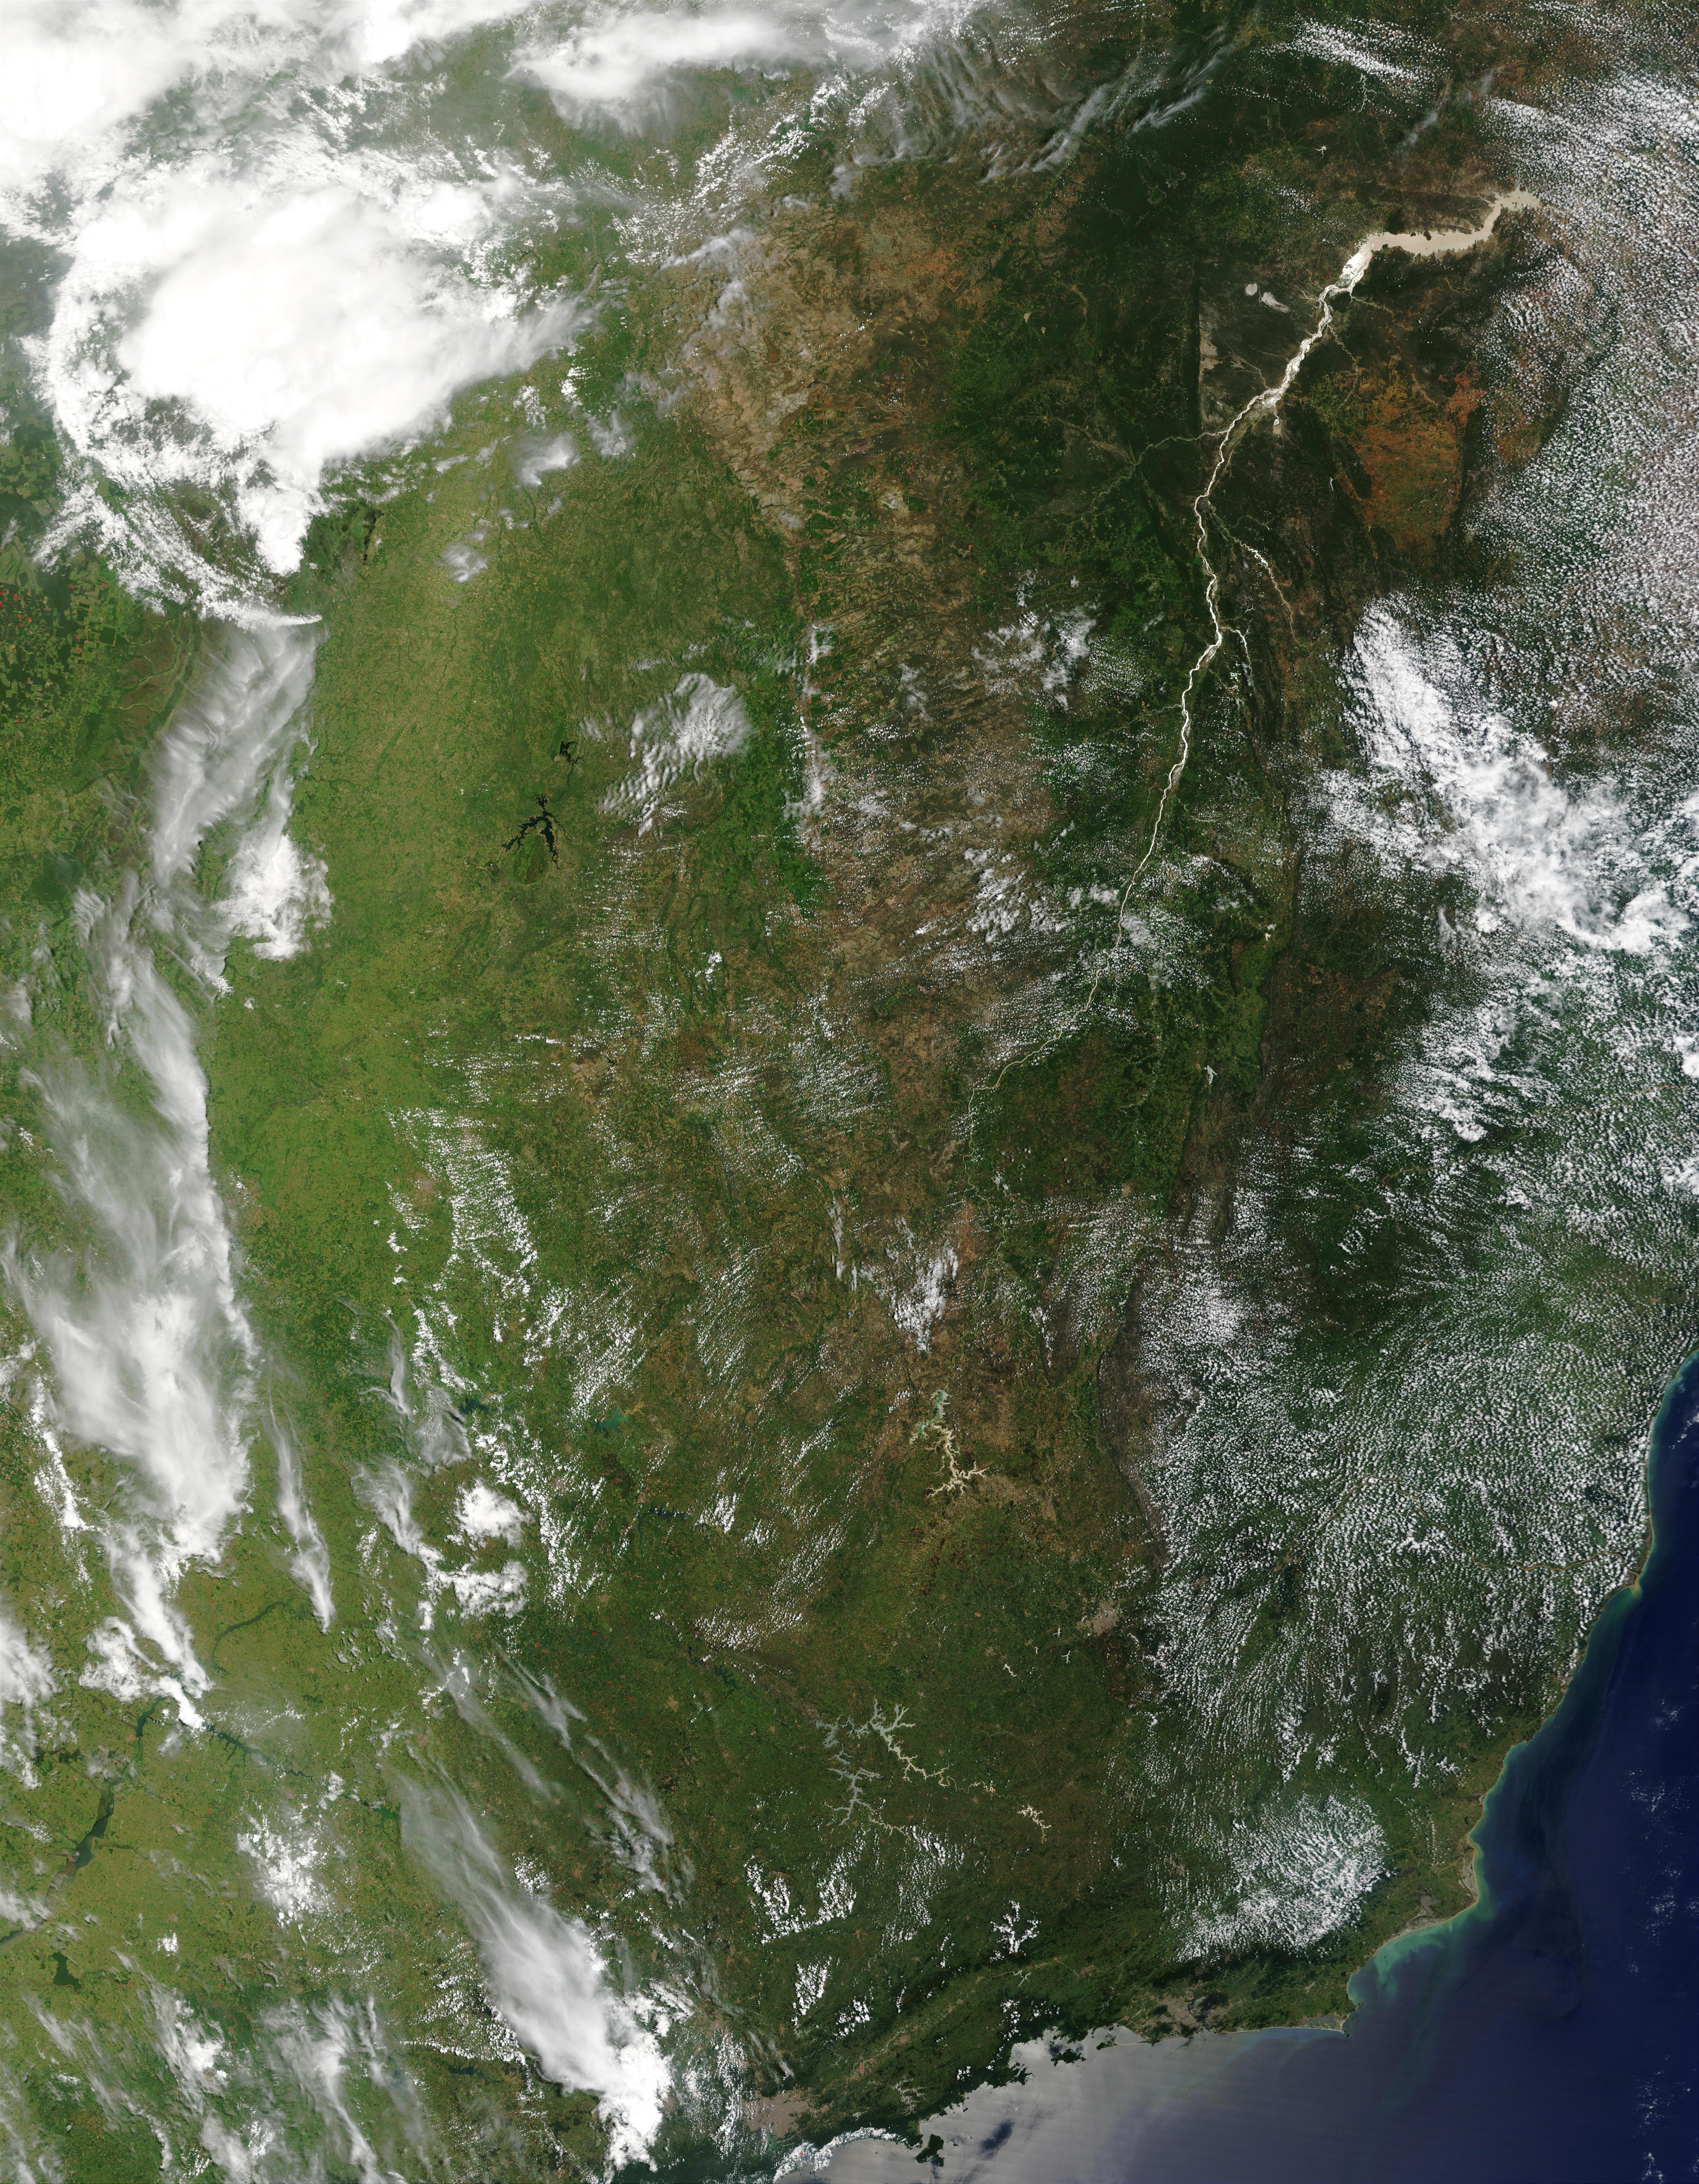 Brasil suroriental